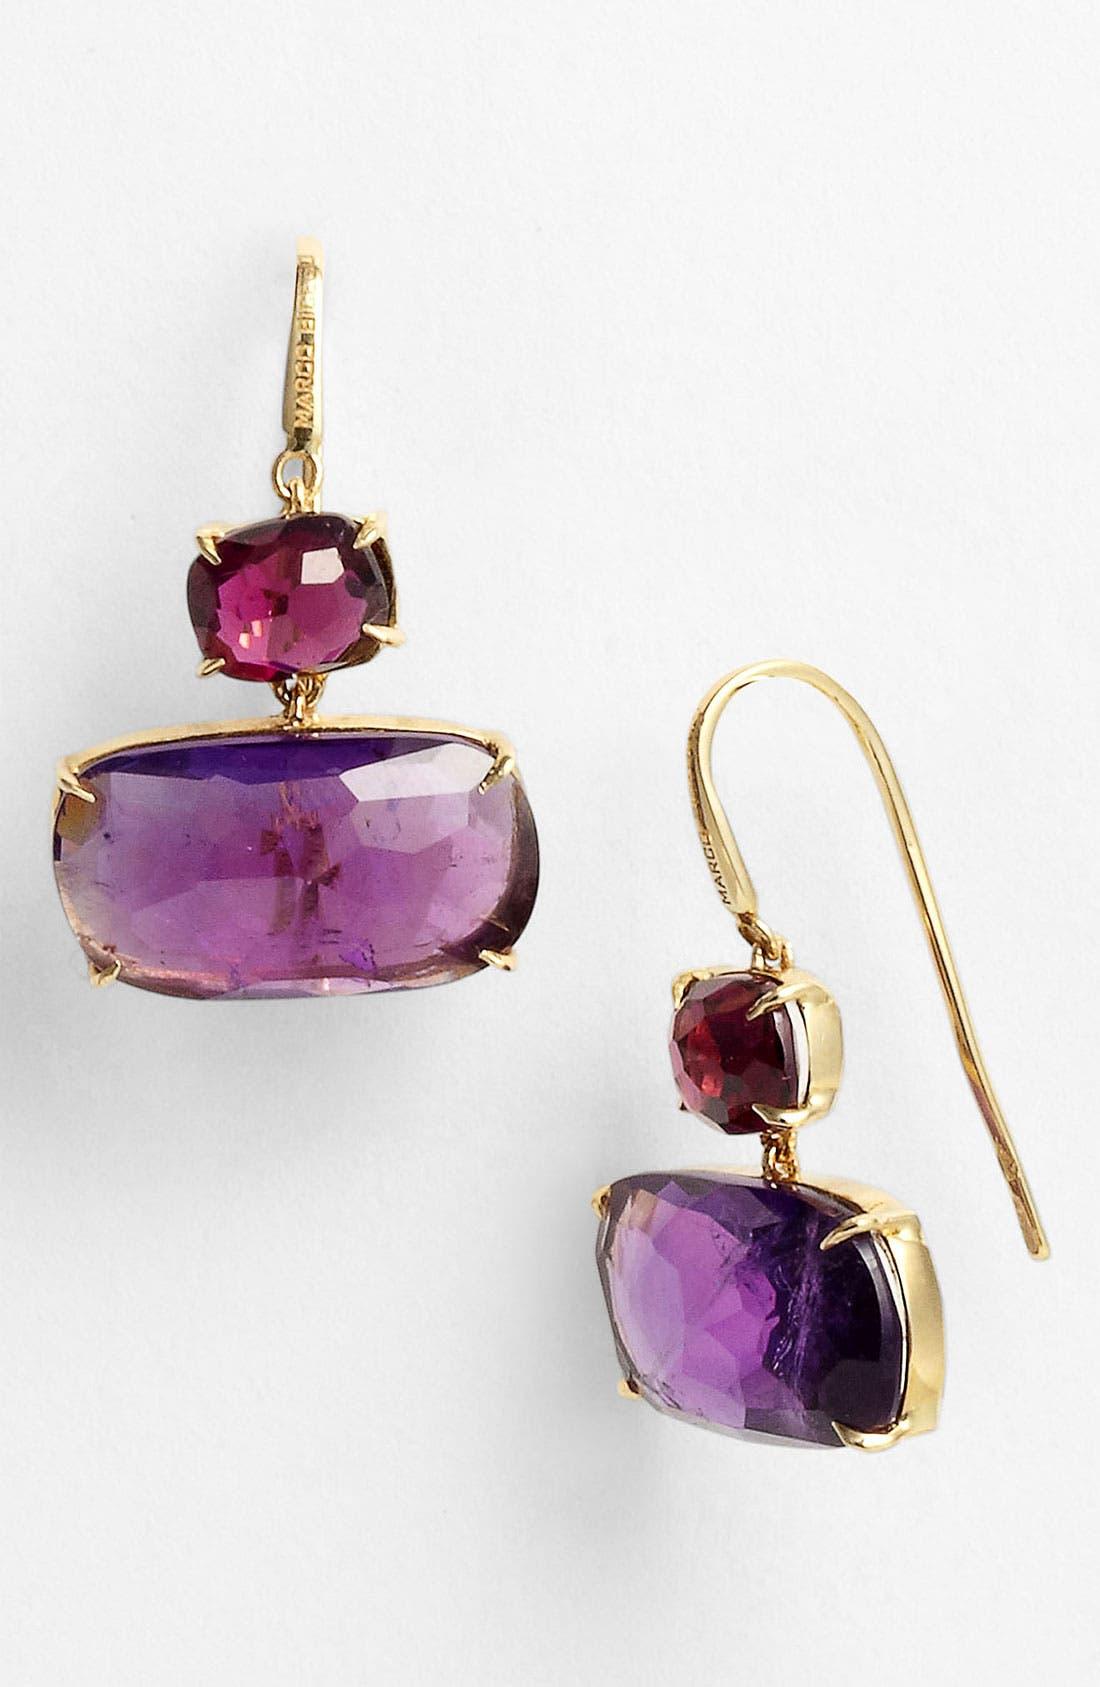 Alternate Image 1 Selected - Marco Bicego 'Murano' Garnet & Amethyst Drop Earrings